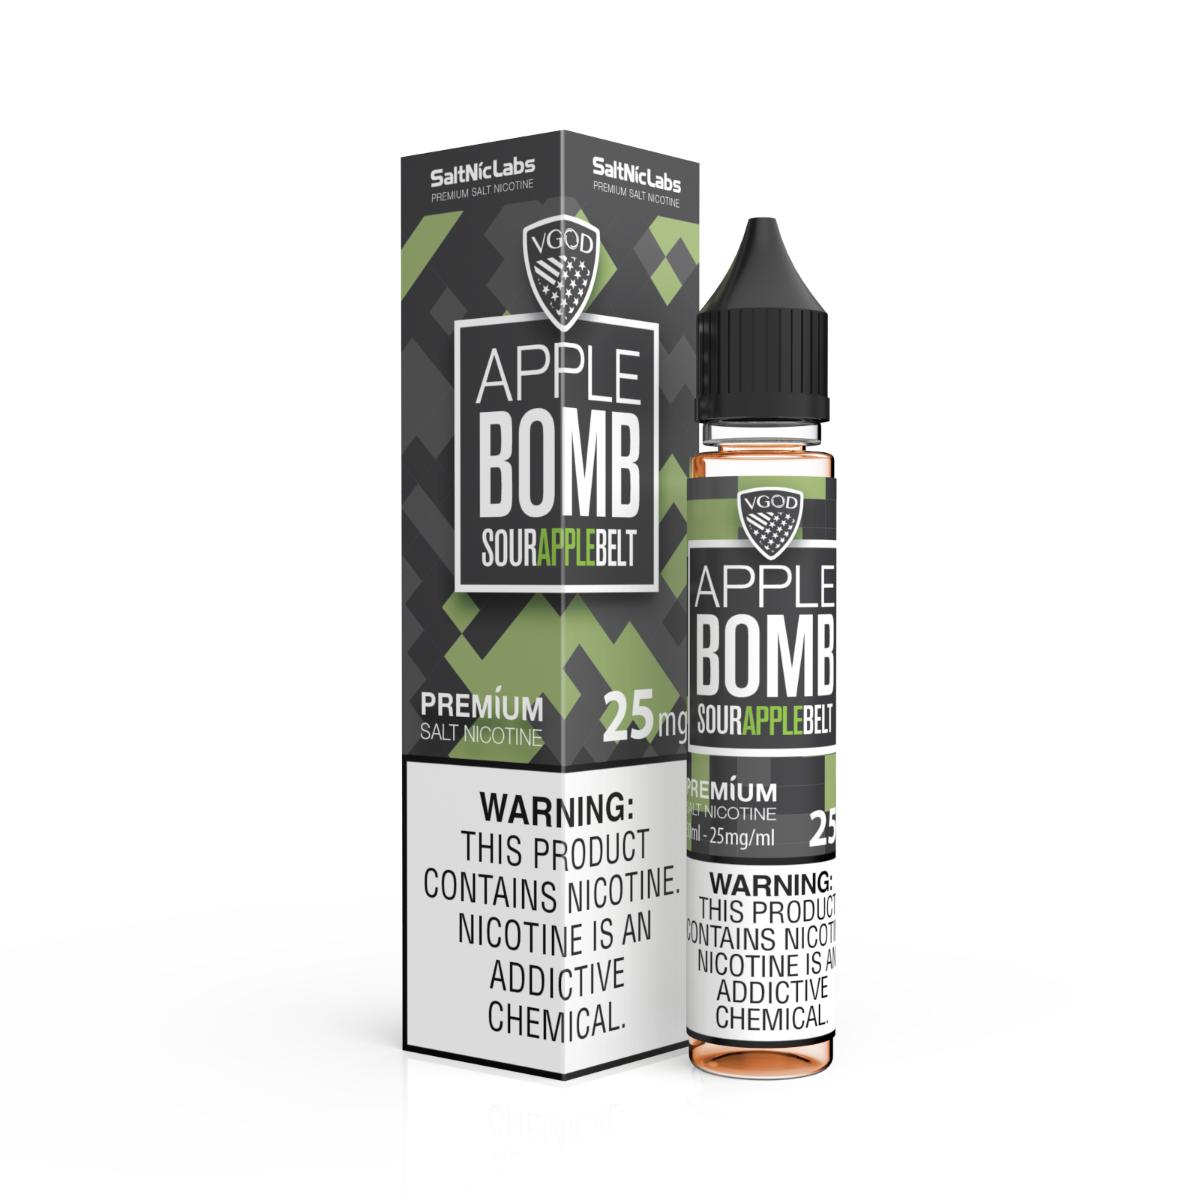 VGOD Apple Bomb SaltNic